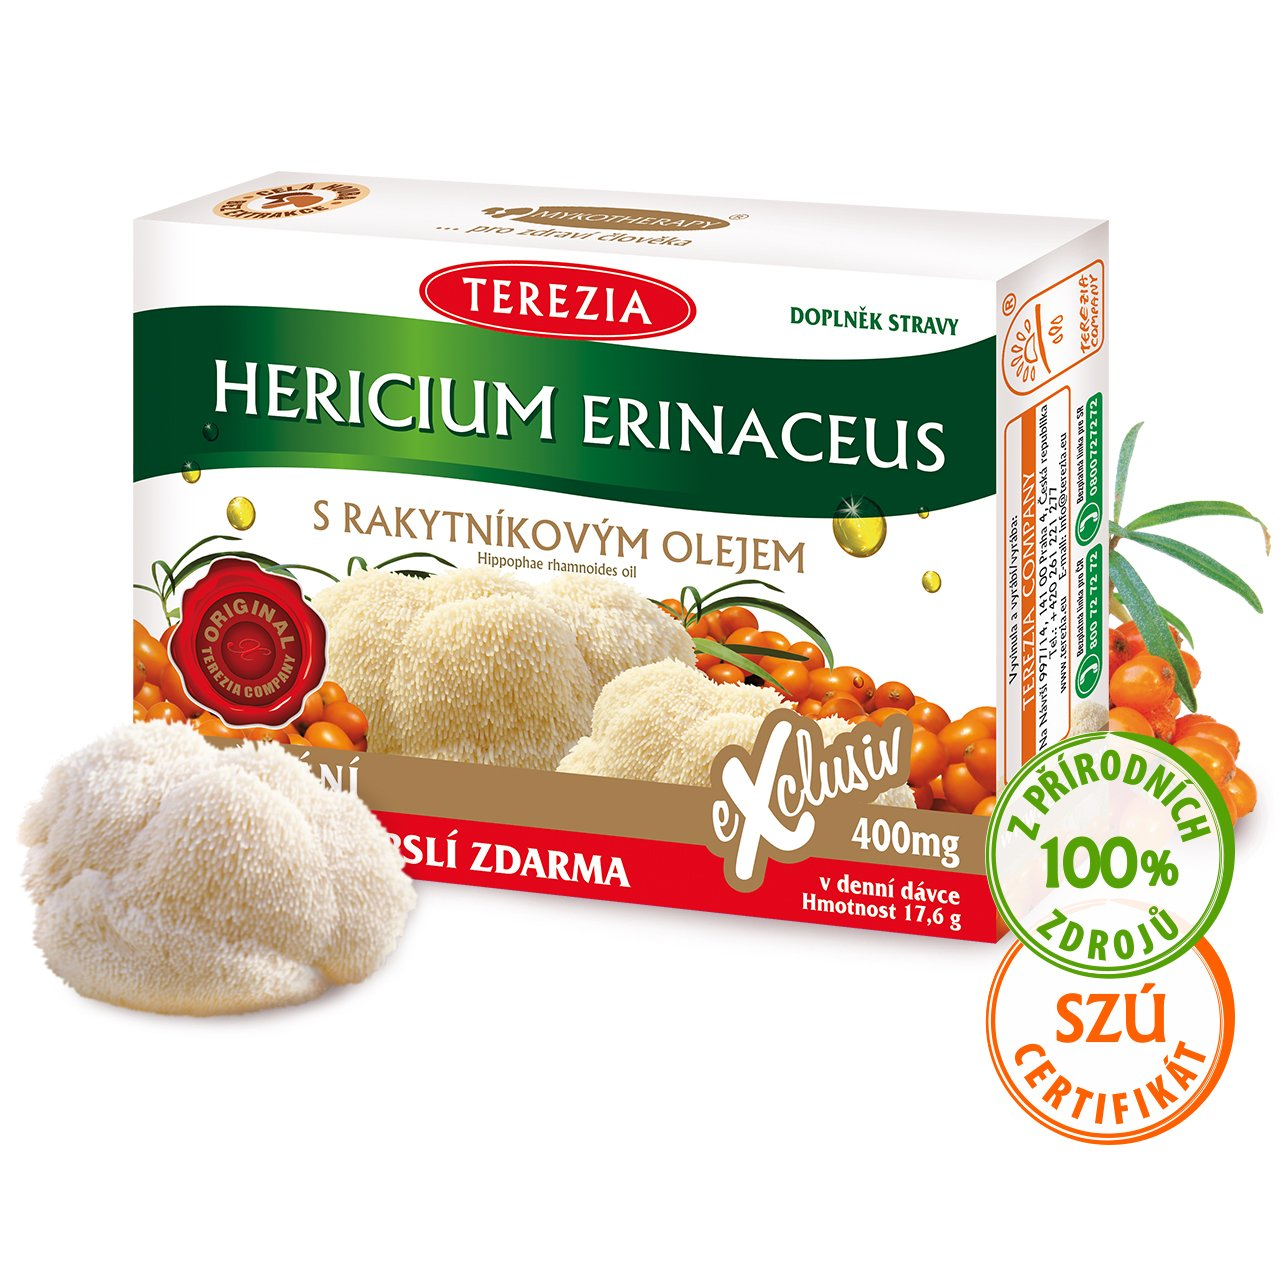 Levně Hericium erinaceus s rakytníkovým olejem